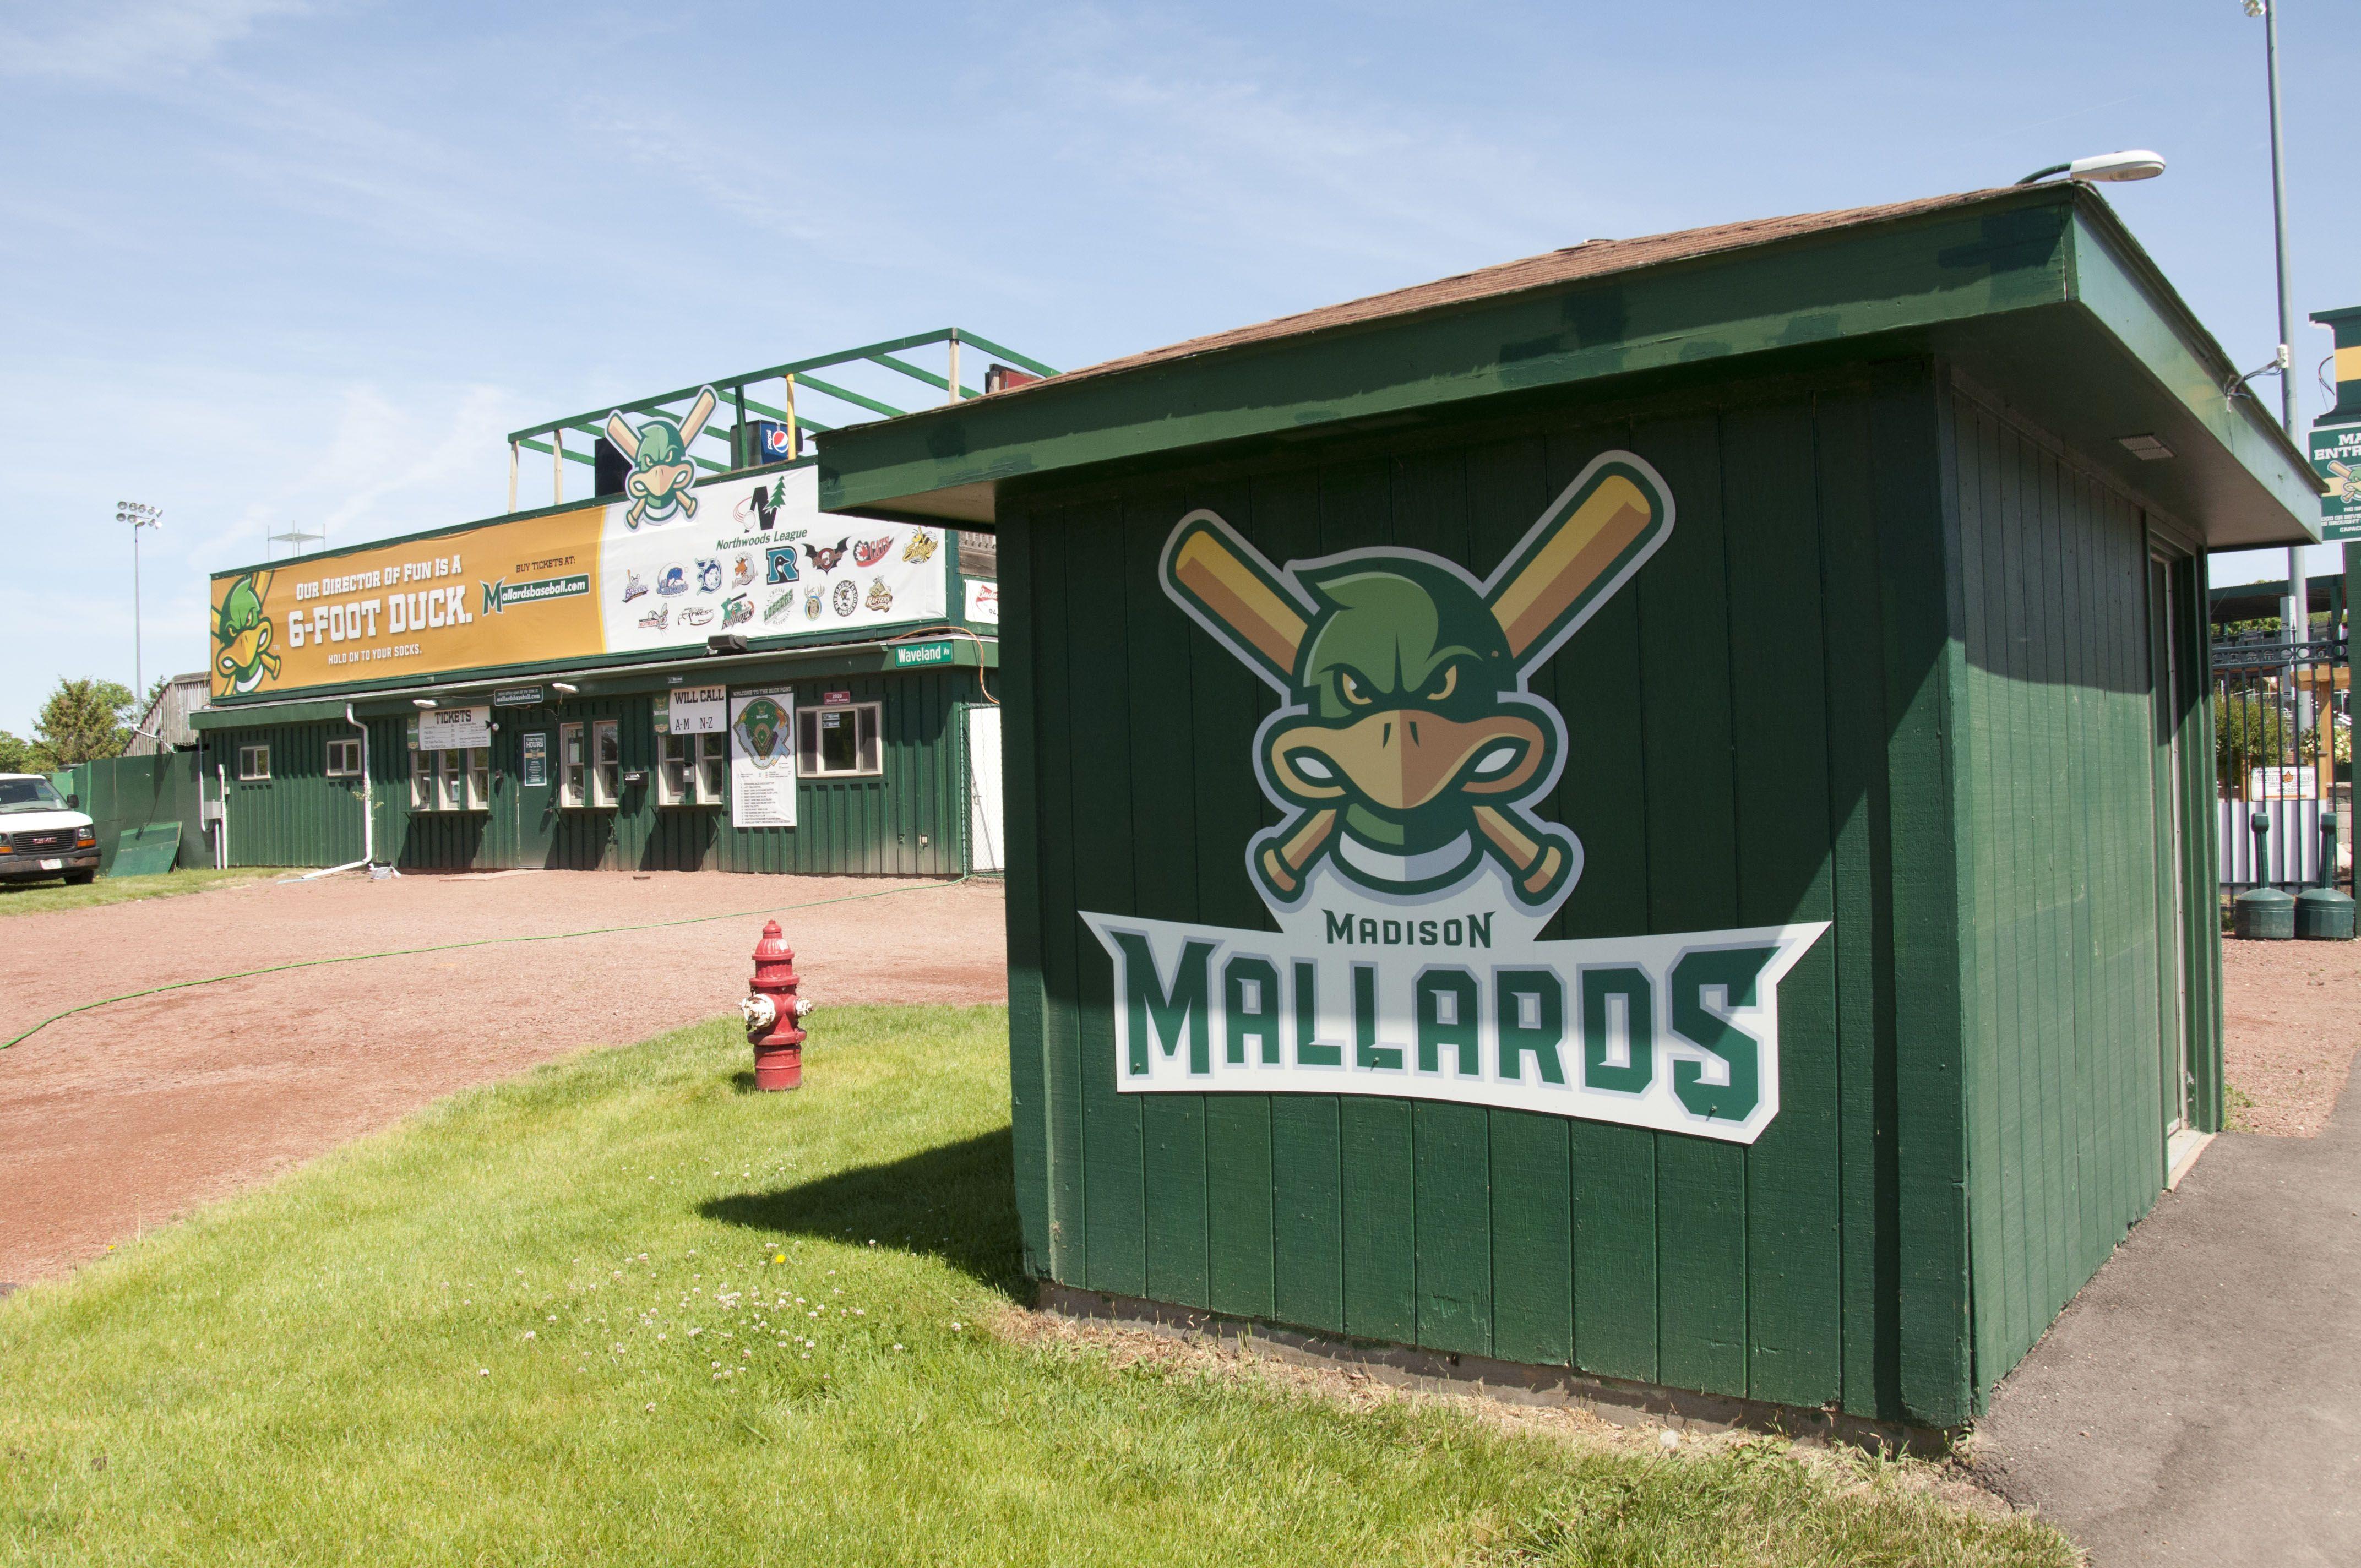 Madison Mallards Warner Park In Madison, #Wisconsin